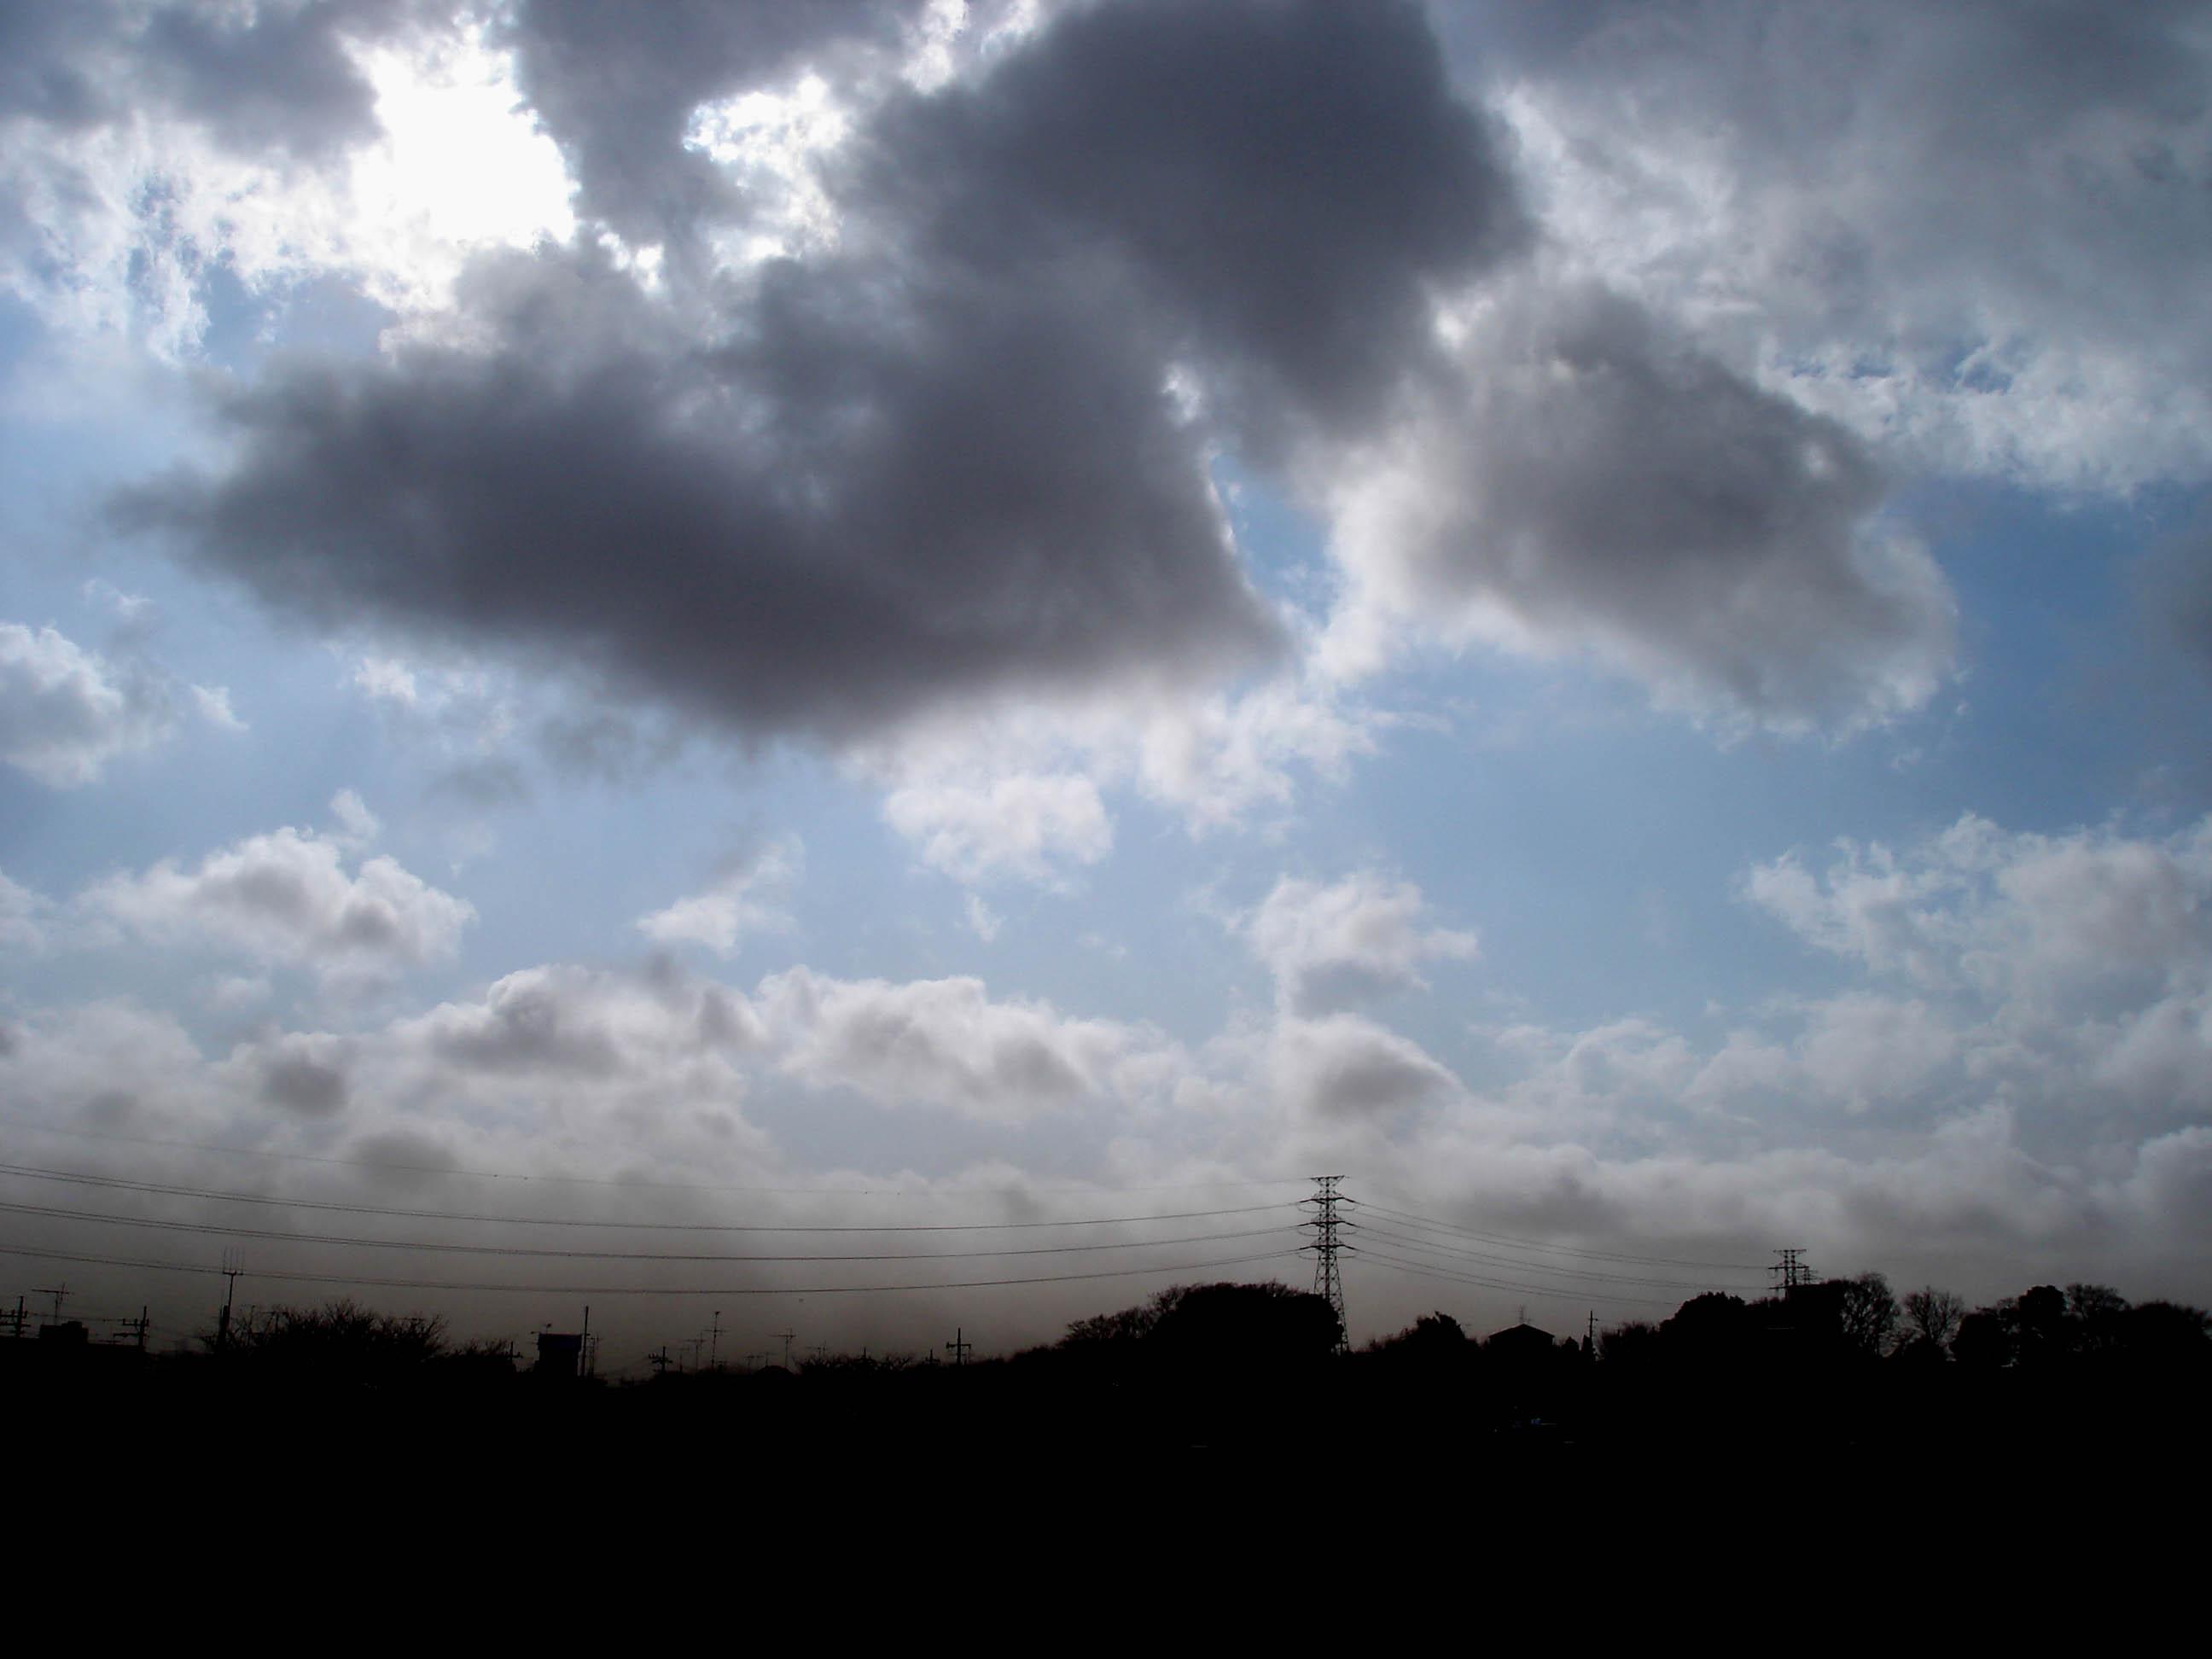 Dsc00437 旋風の通過44 西方面の様子①